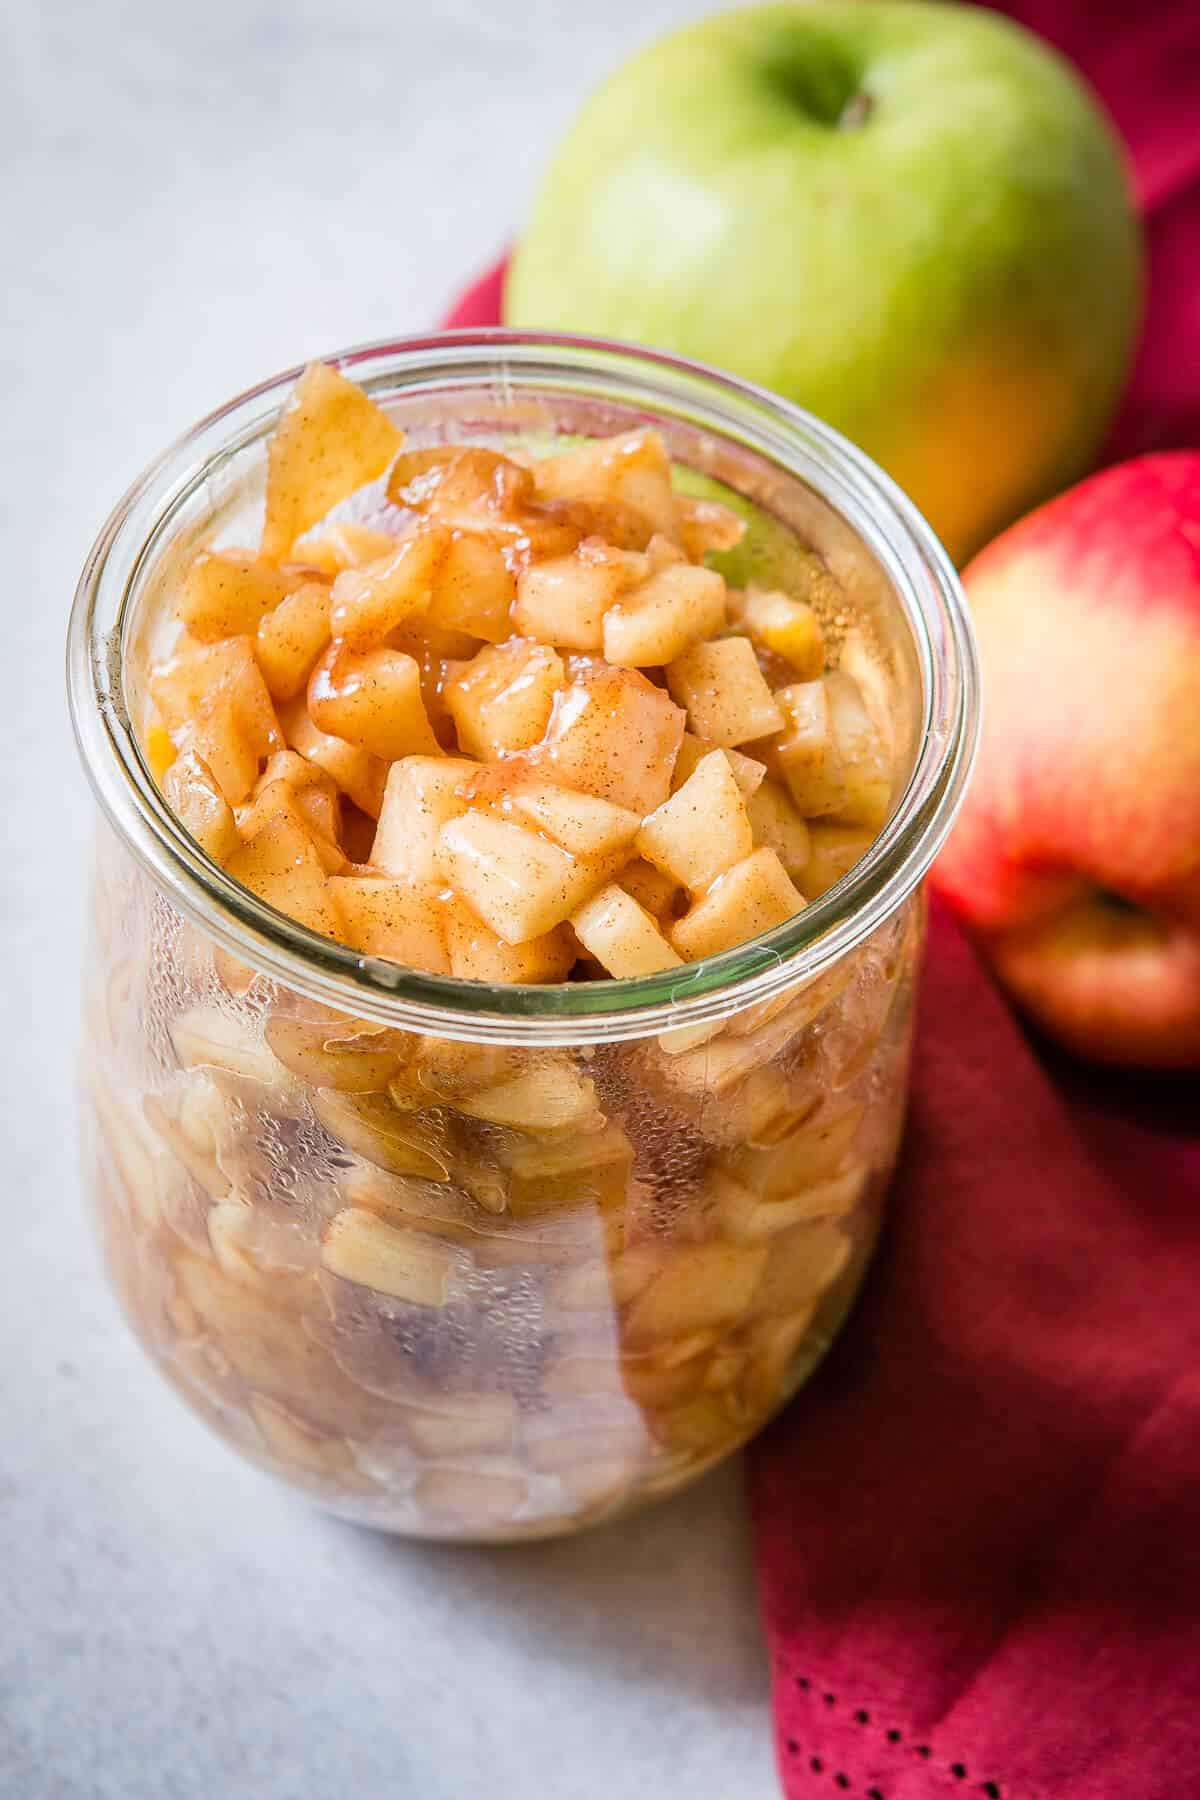 Apple Pie Filling  Easy Homemade Apple Pie Filling Oh Sweet Basil